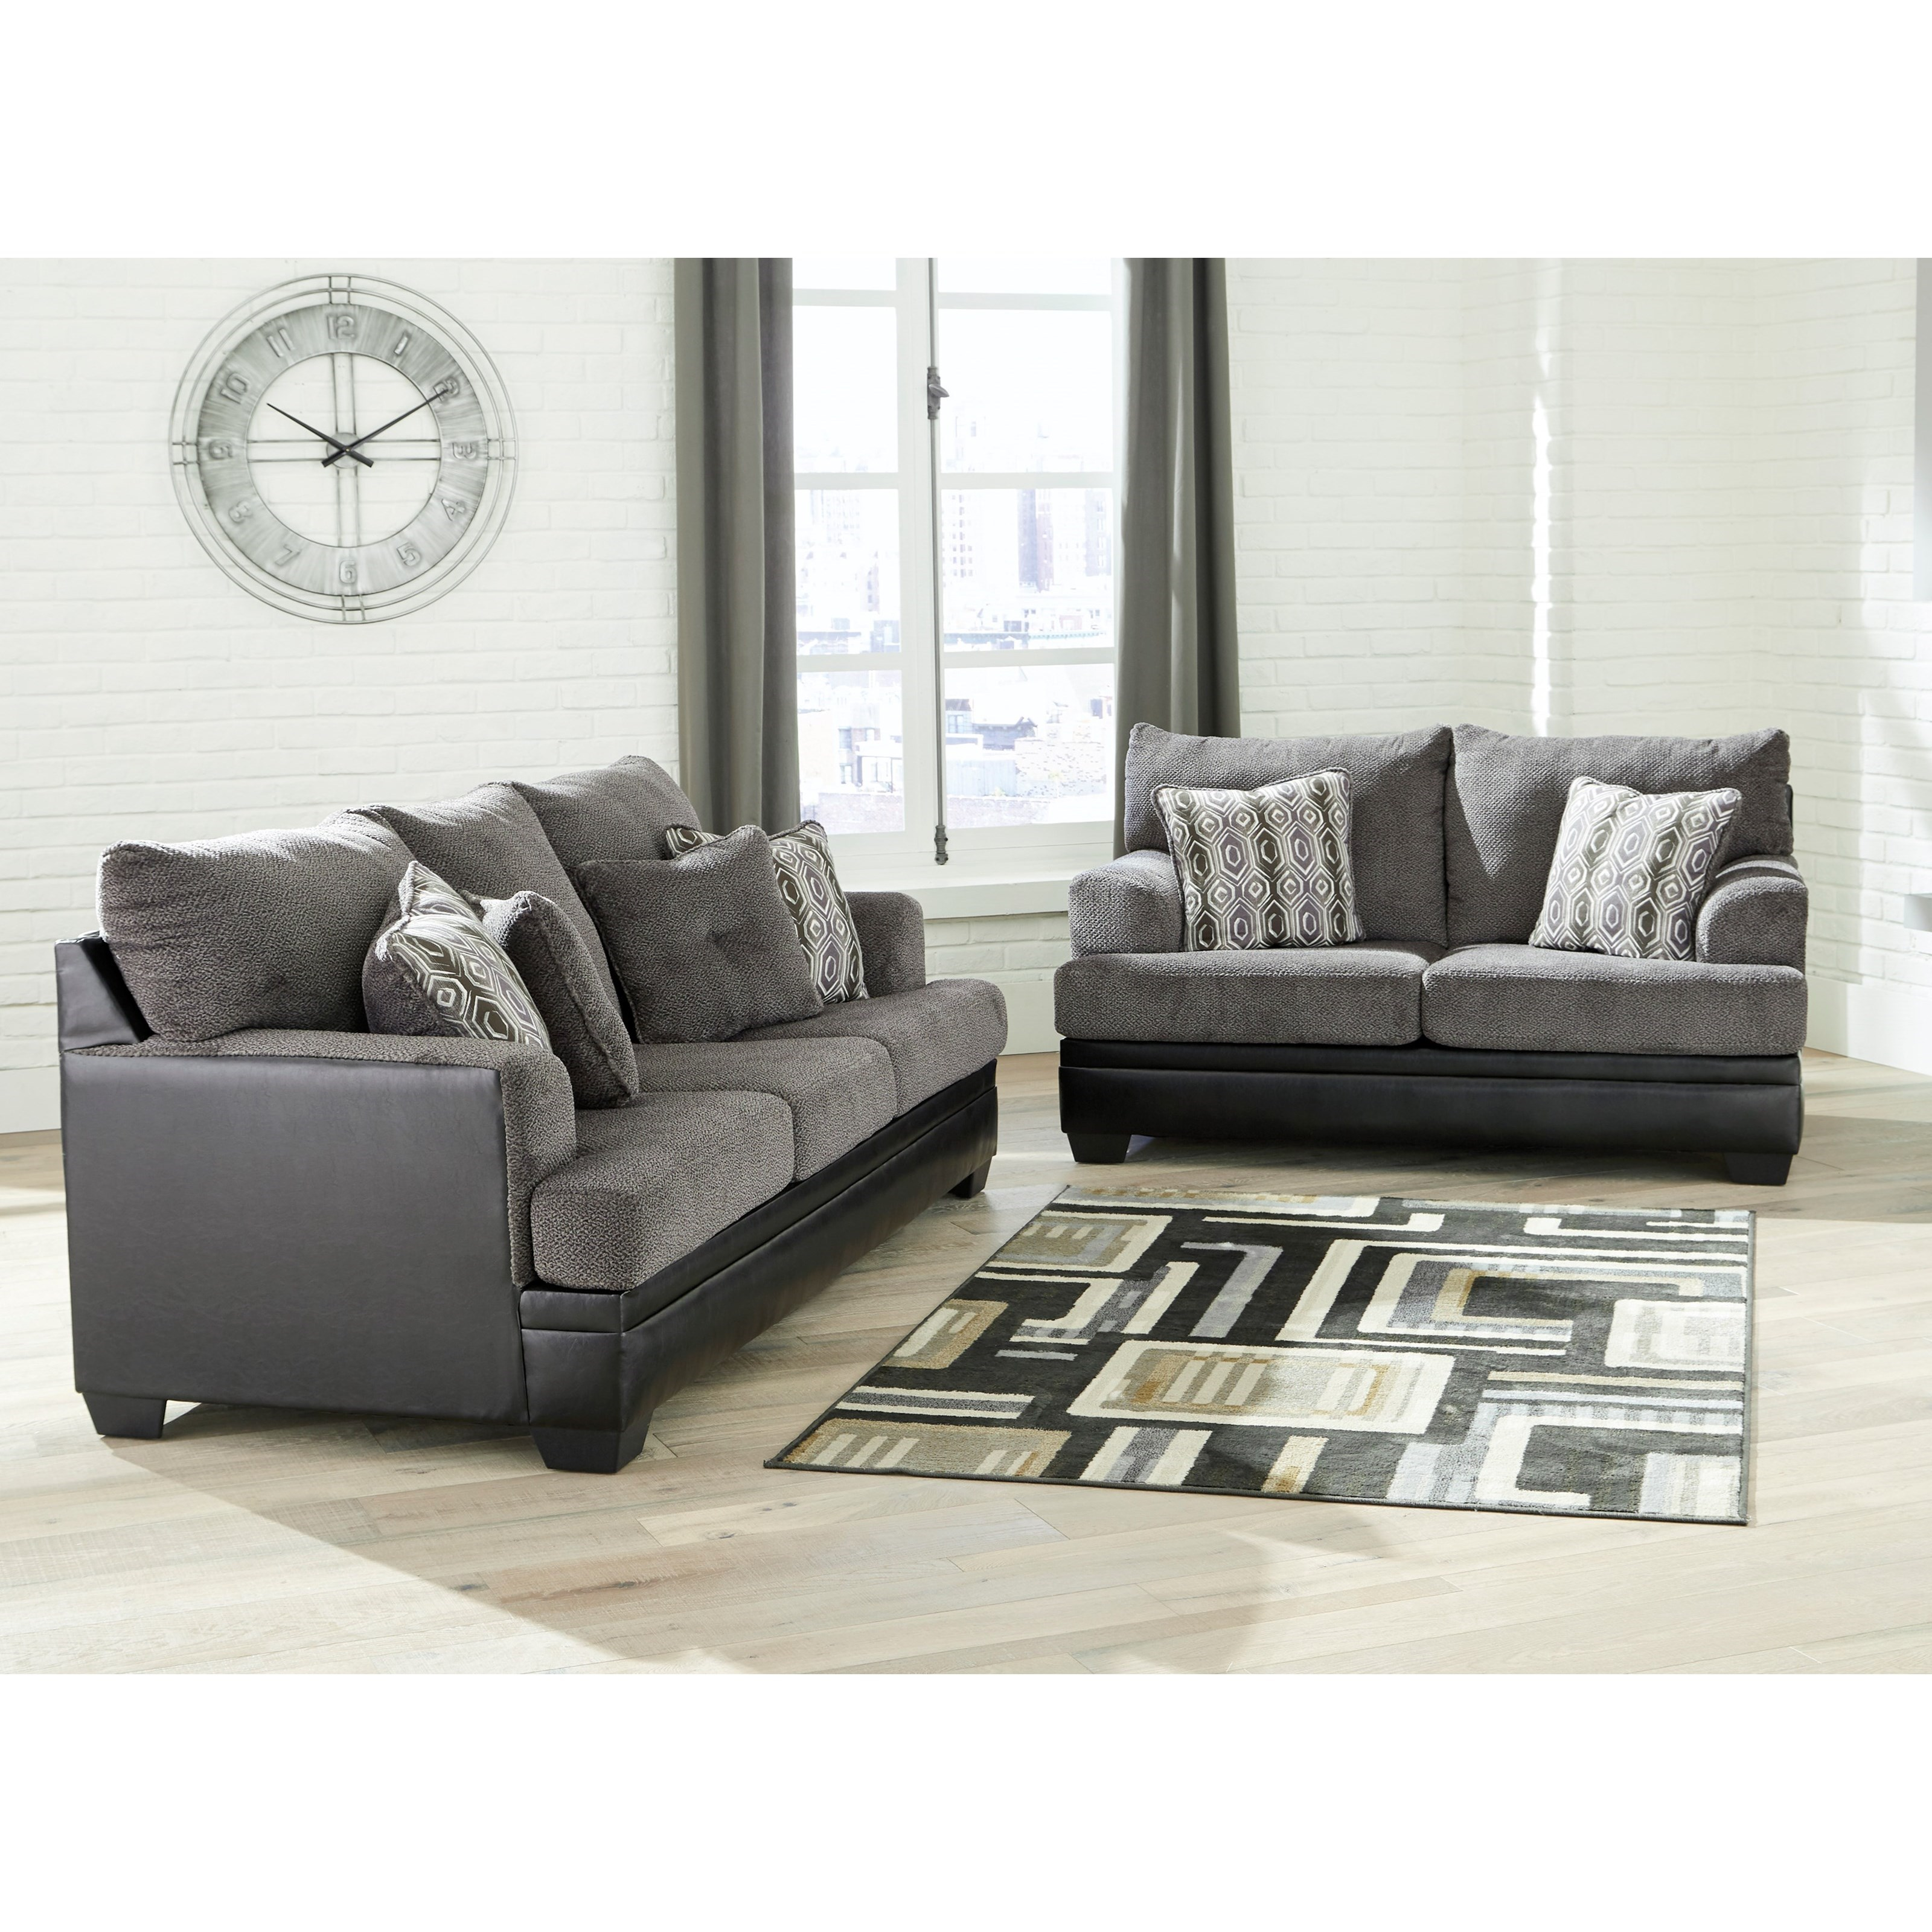 Levits Furniture: Signature Design By Ashley Millingar 7820235 Contemporary